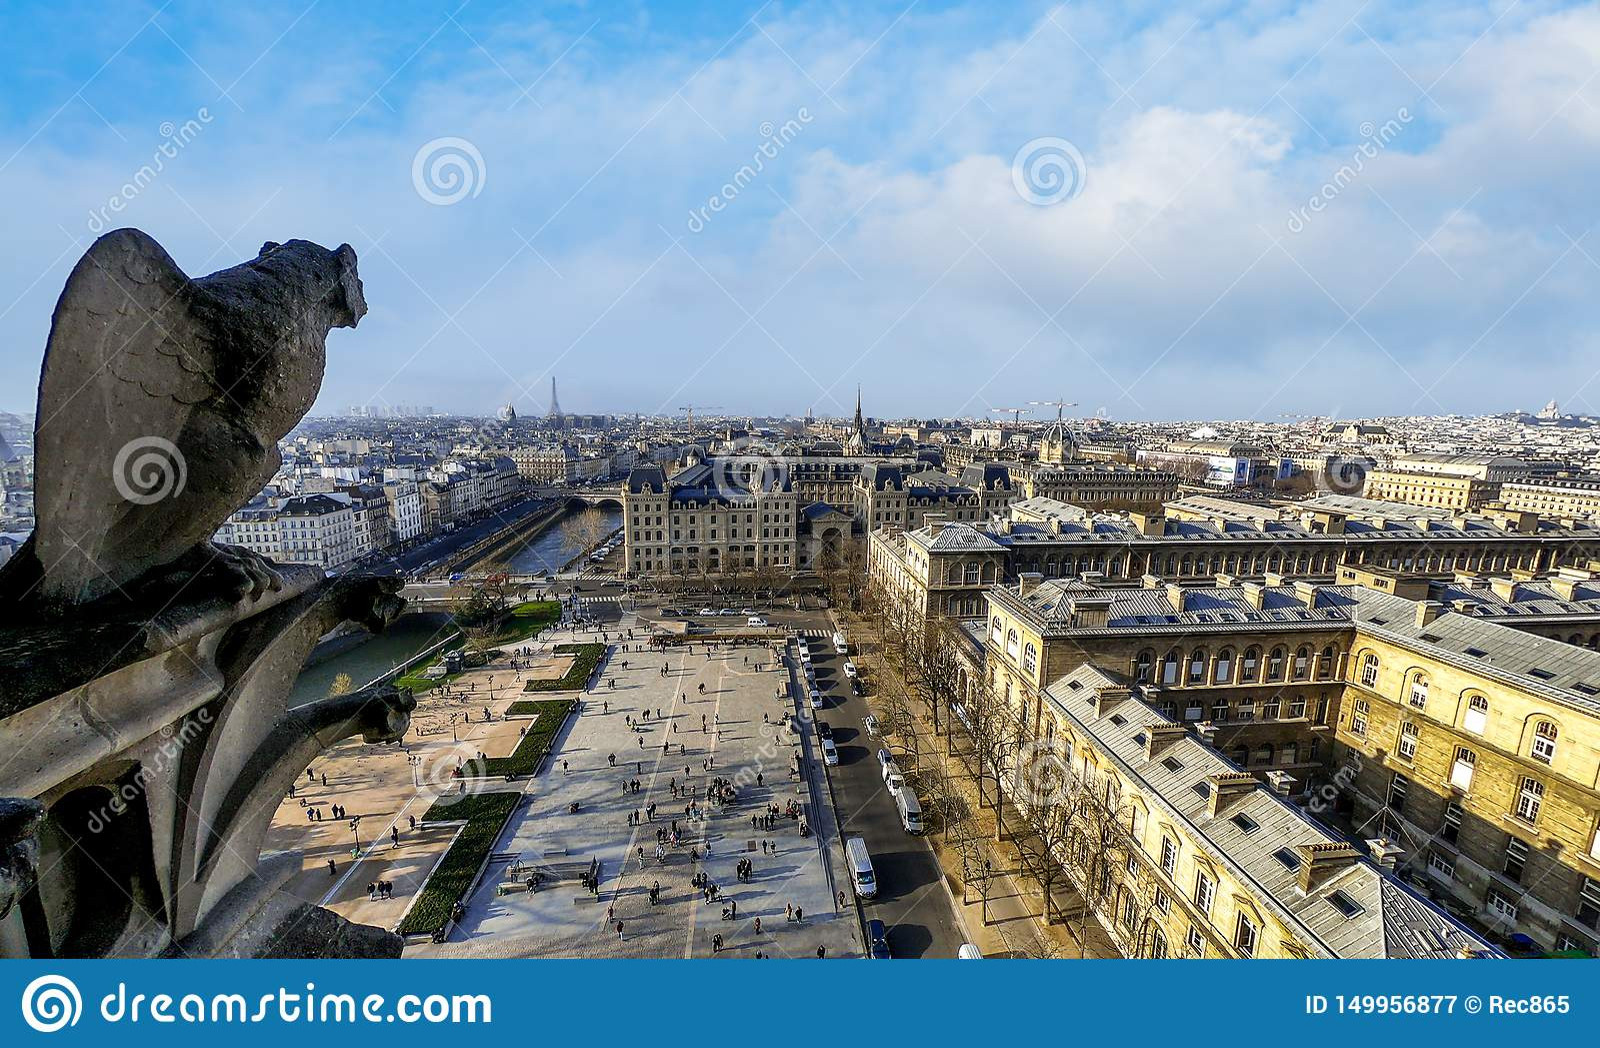 Berömd stenvattenkastarestaty i Notre Dame Cathedral With City Of Paris